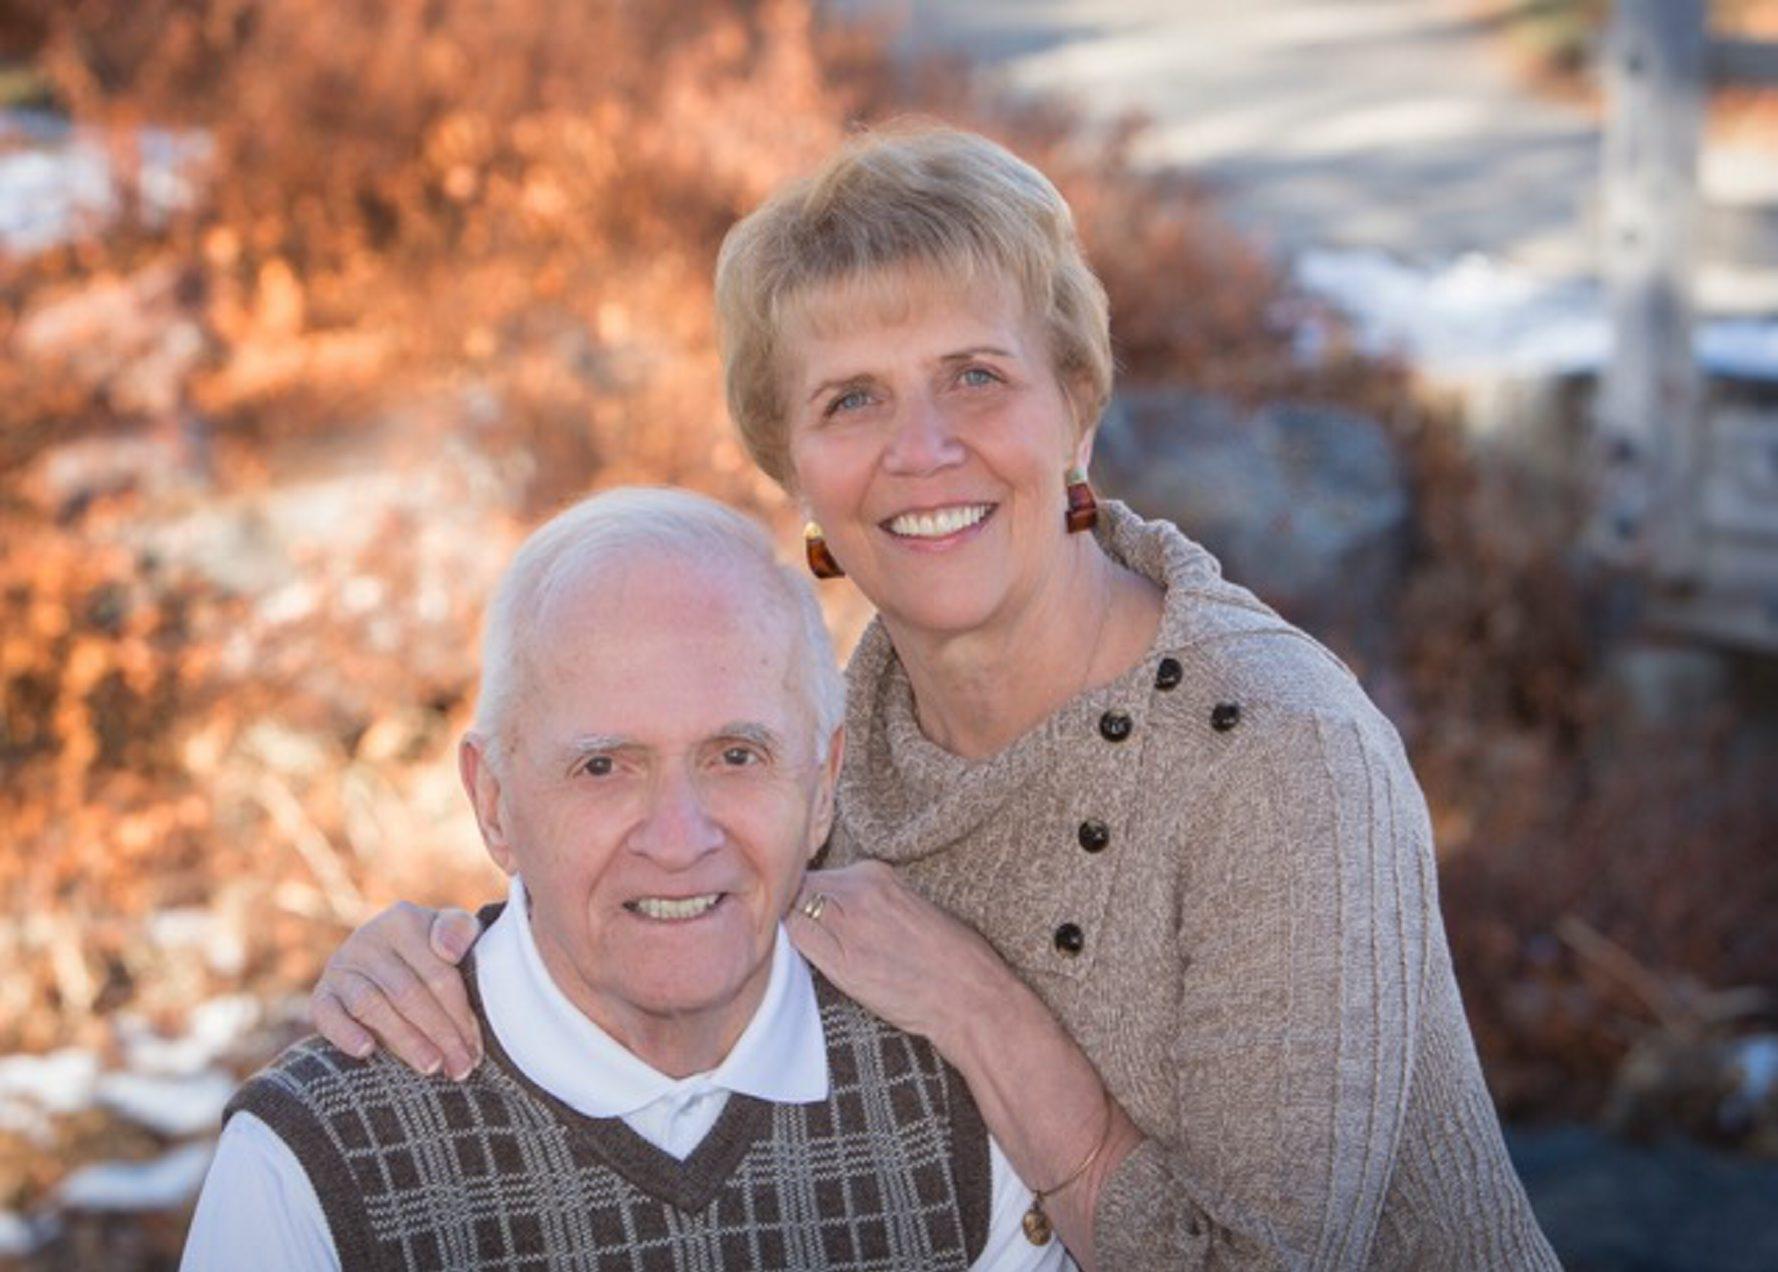 Richard and Barbara Eckerman celebrate 50th wedding anniversary